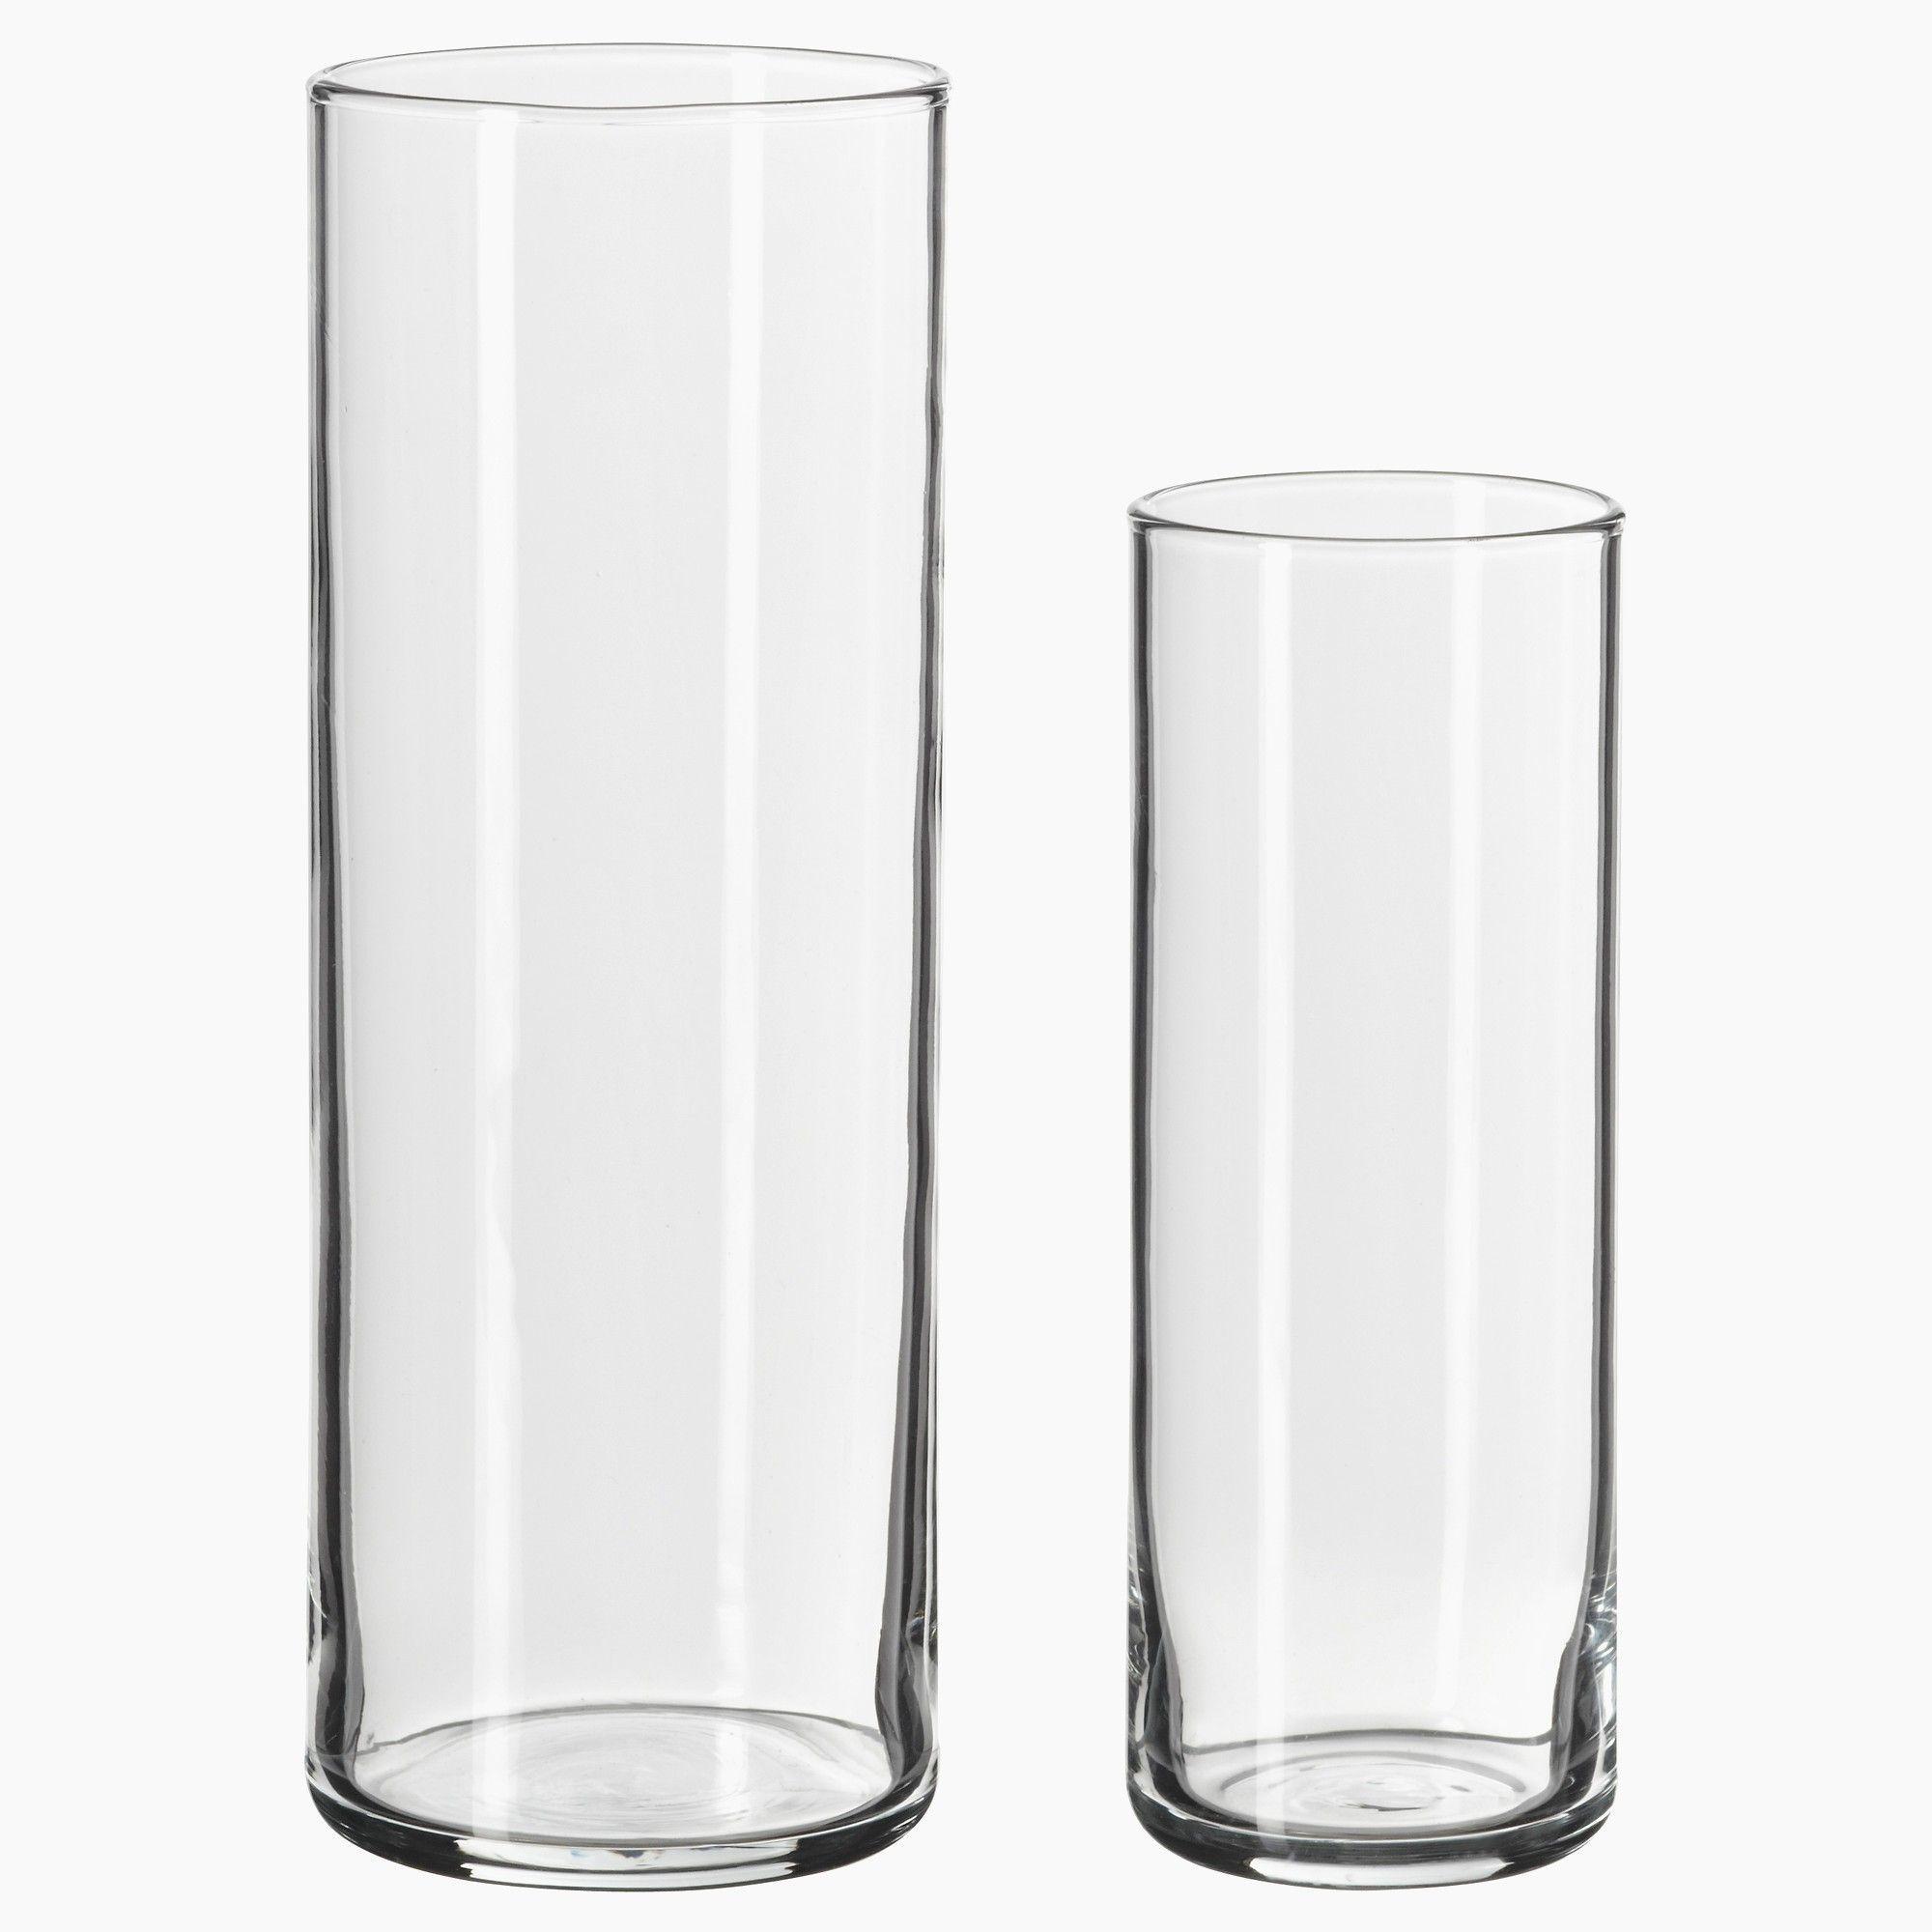 Wholesale Floor Vases Of Cheap Vases for Sale Elegant Ikea Floor Vases 5l Home Design Vase Regarding Cheap Vases for Sale Elegant Ikea Floor Vases 5l Home Design Vase Full Size Living Room